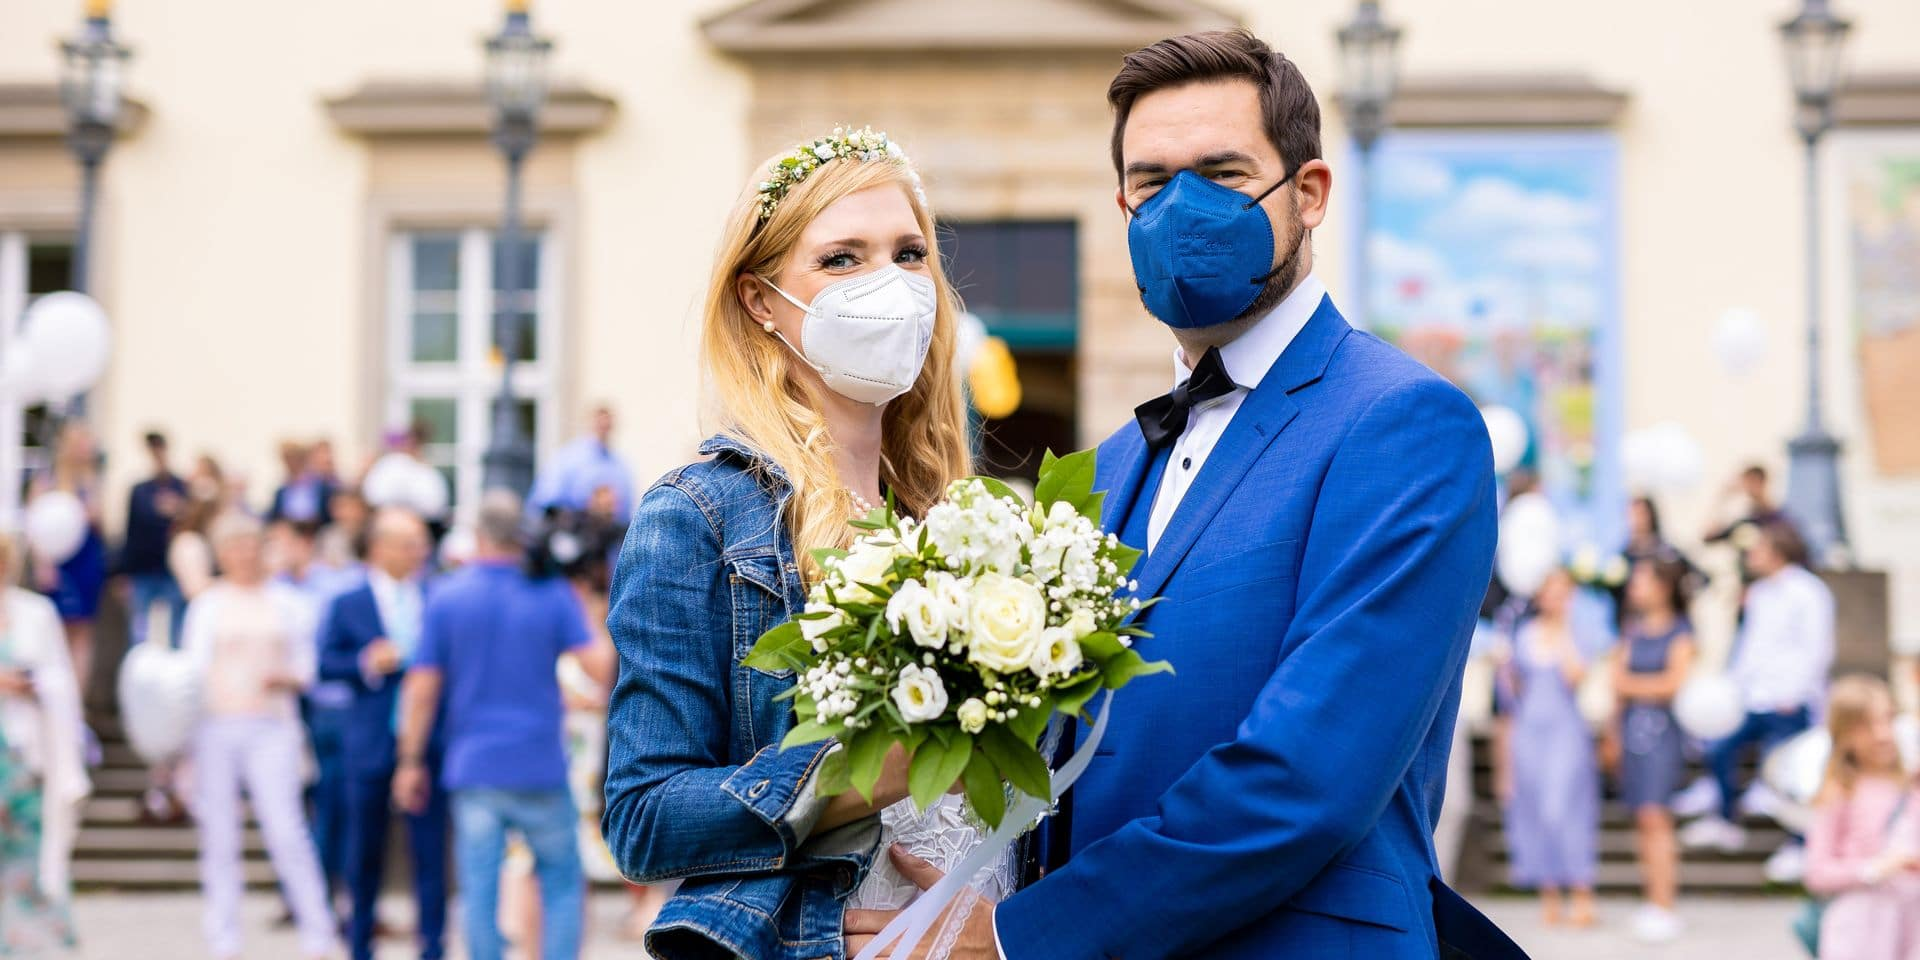 Coronavirus - Weddings in Lower Saxony